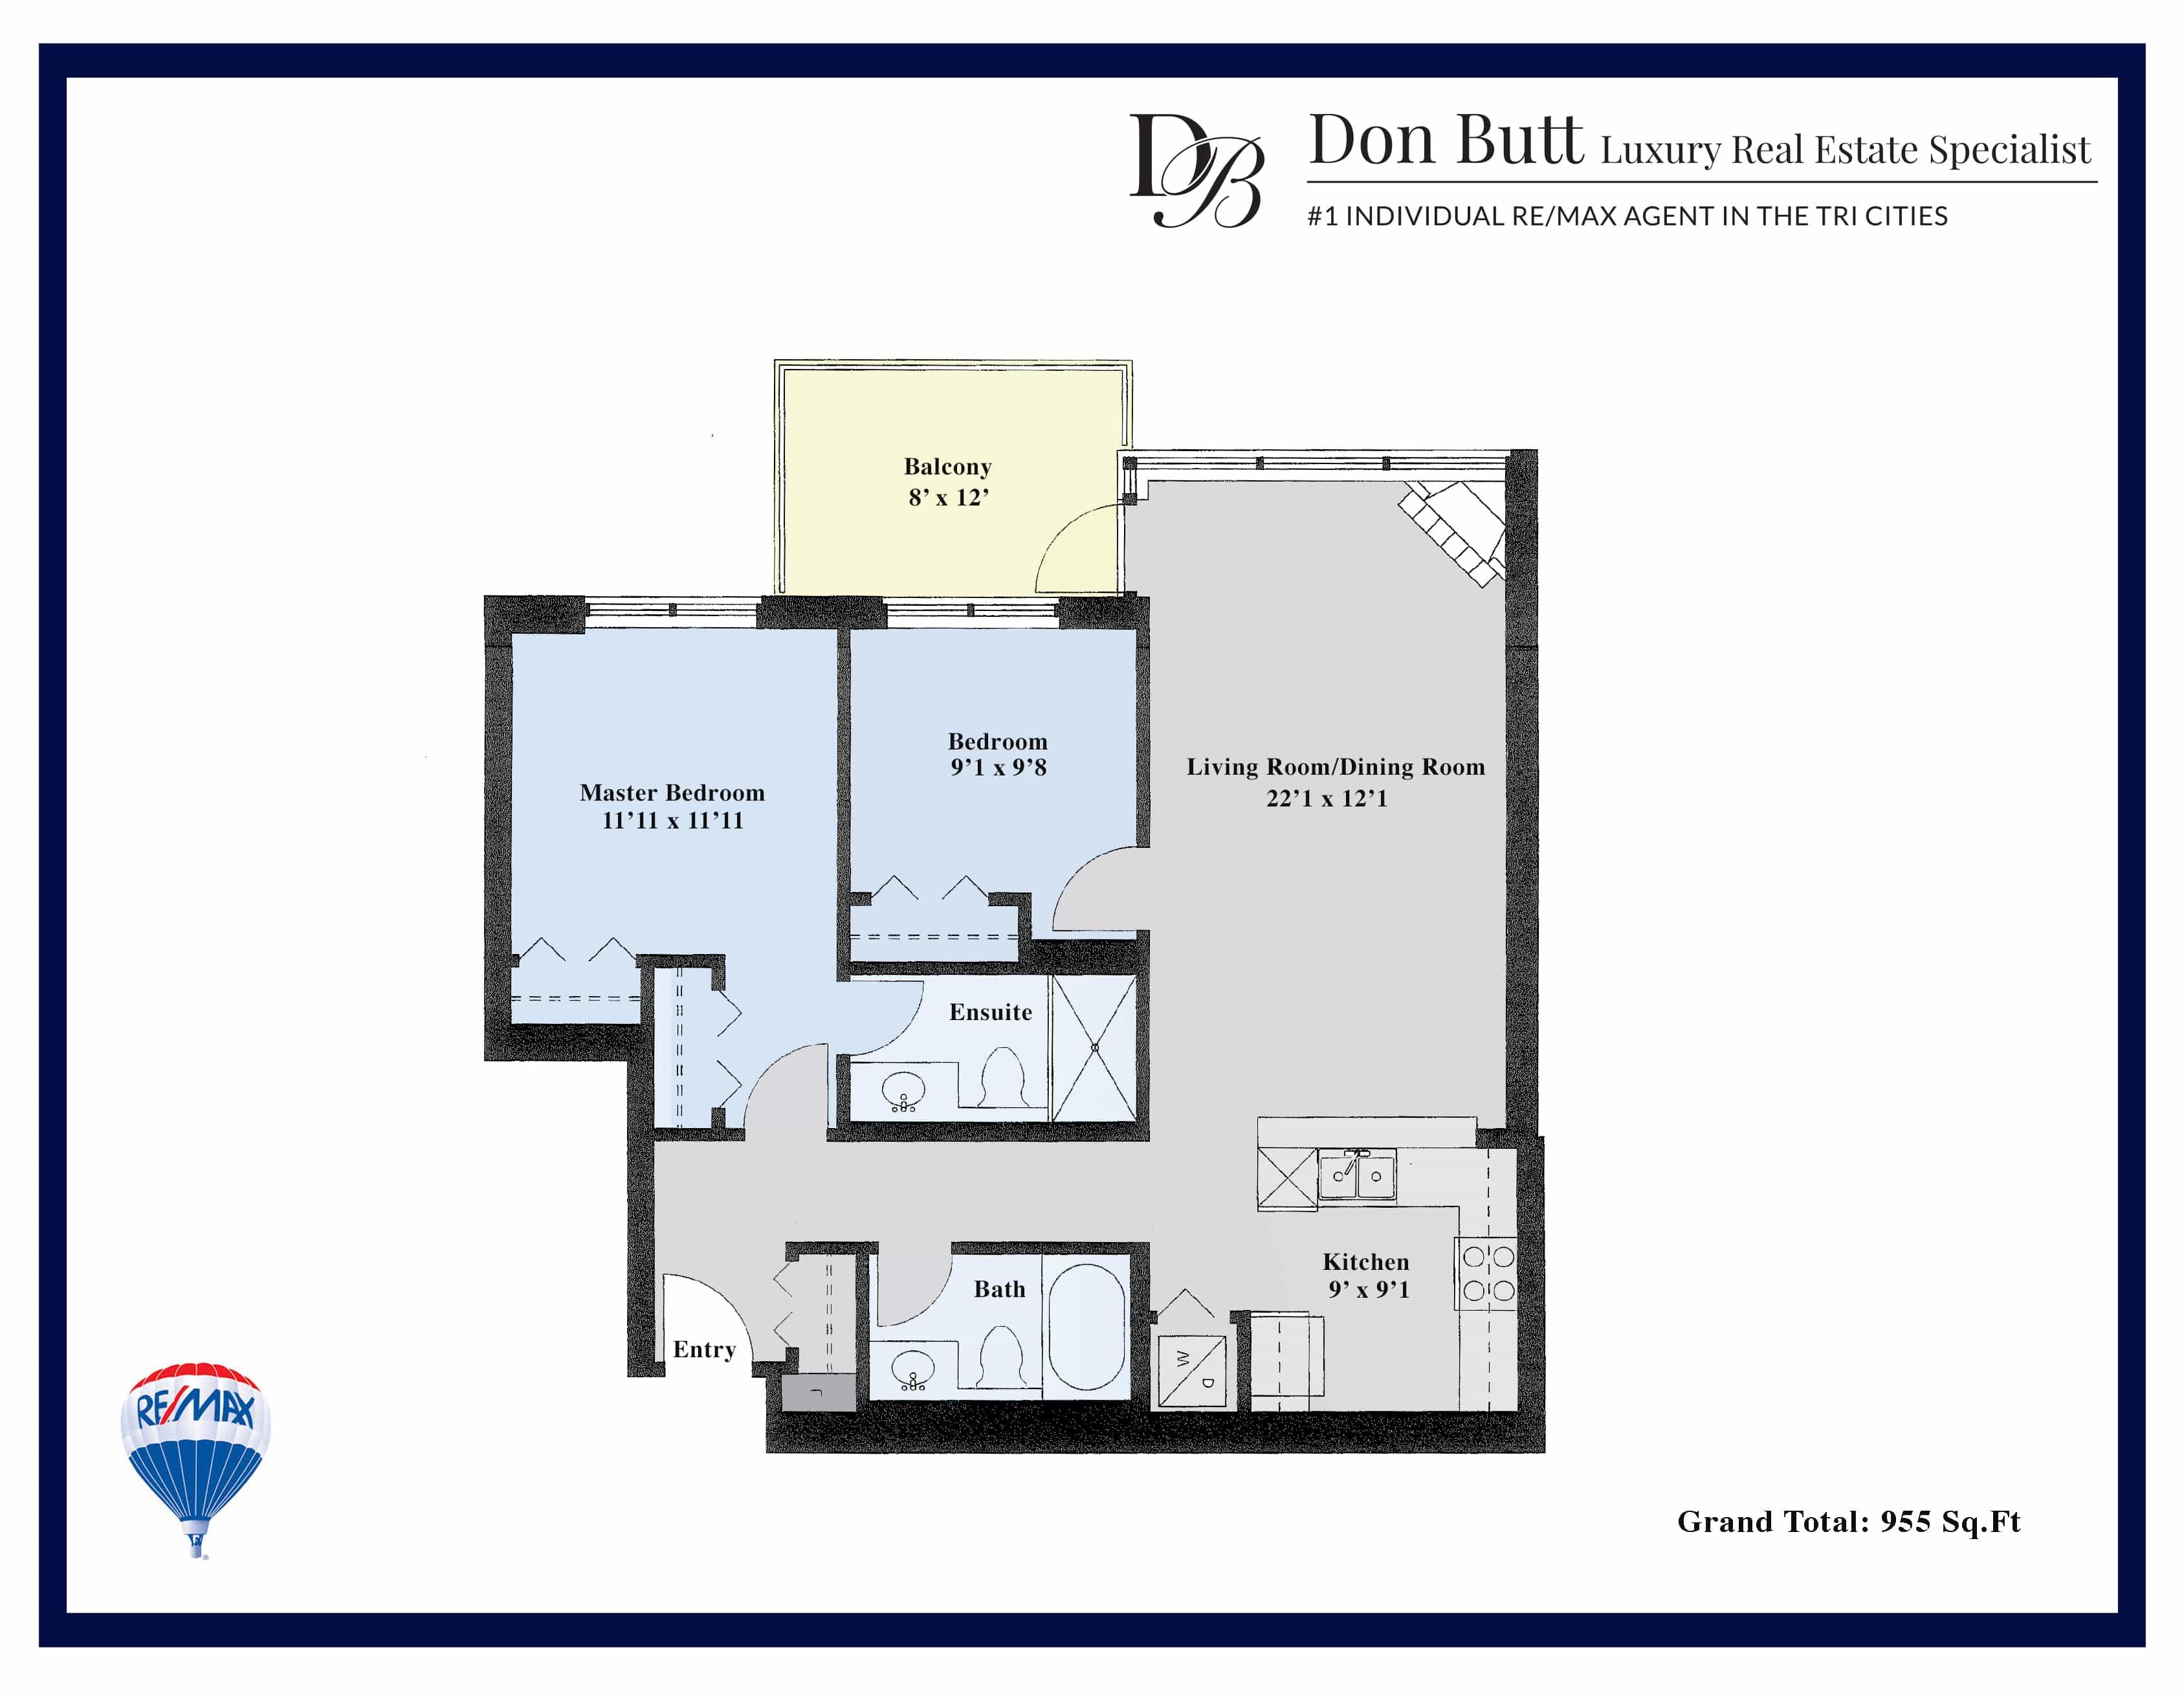 806 235 guildford way port moody don butt real estate. Black Bedroom Furniture Sets. Home Design Ideas